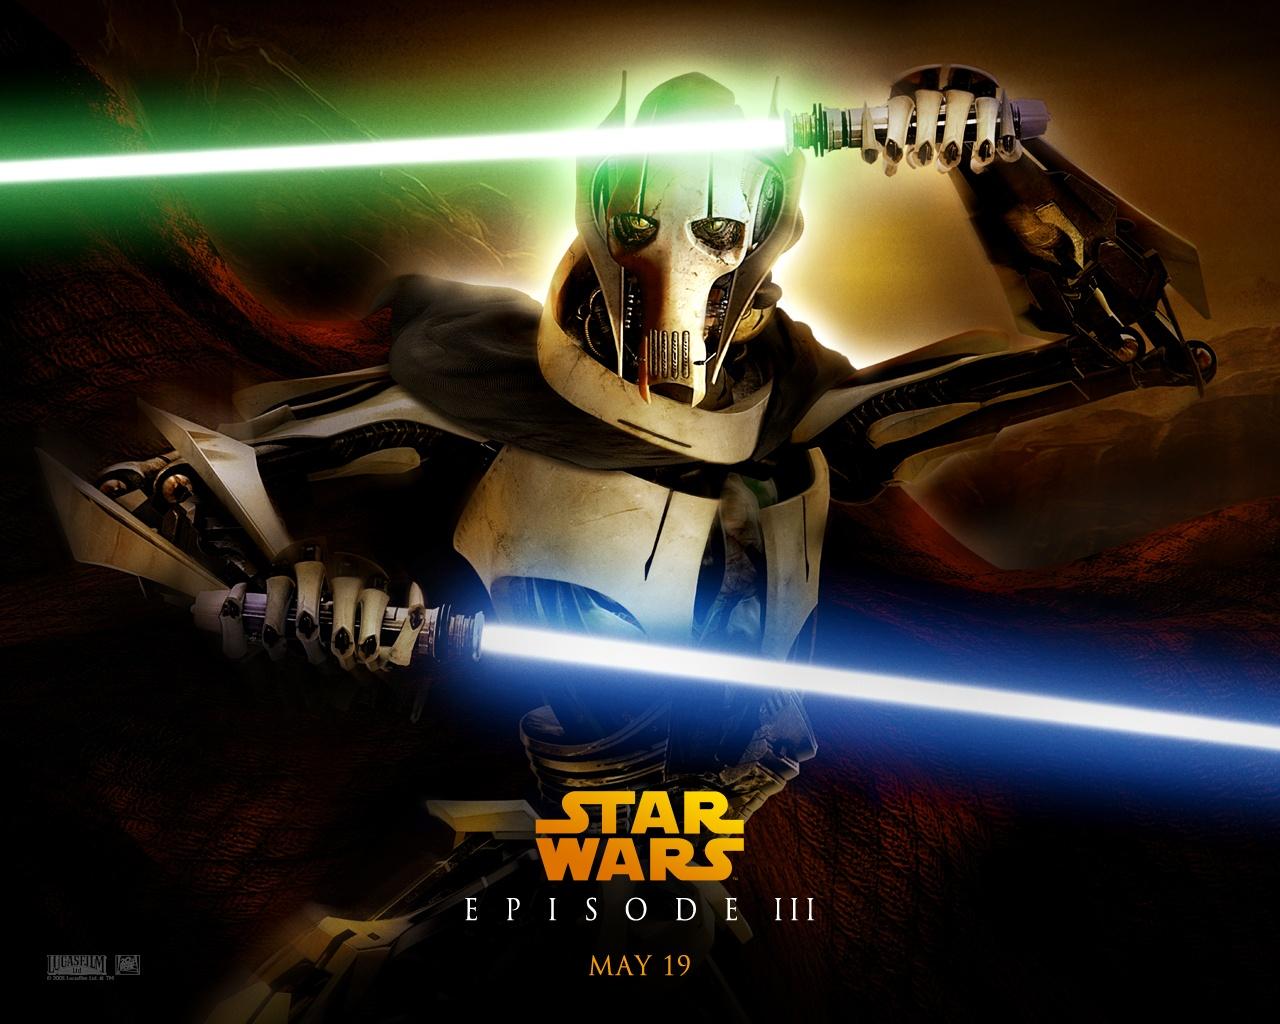 bintang Wars Revenge of the Sith imej ROTS Ep III   General 1280x1024